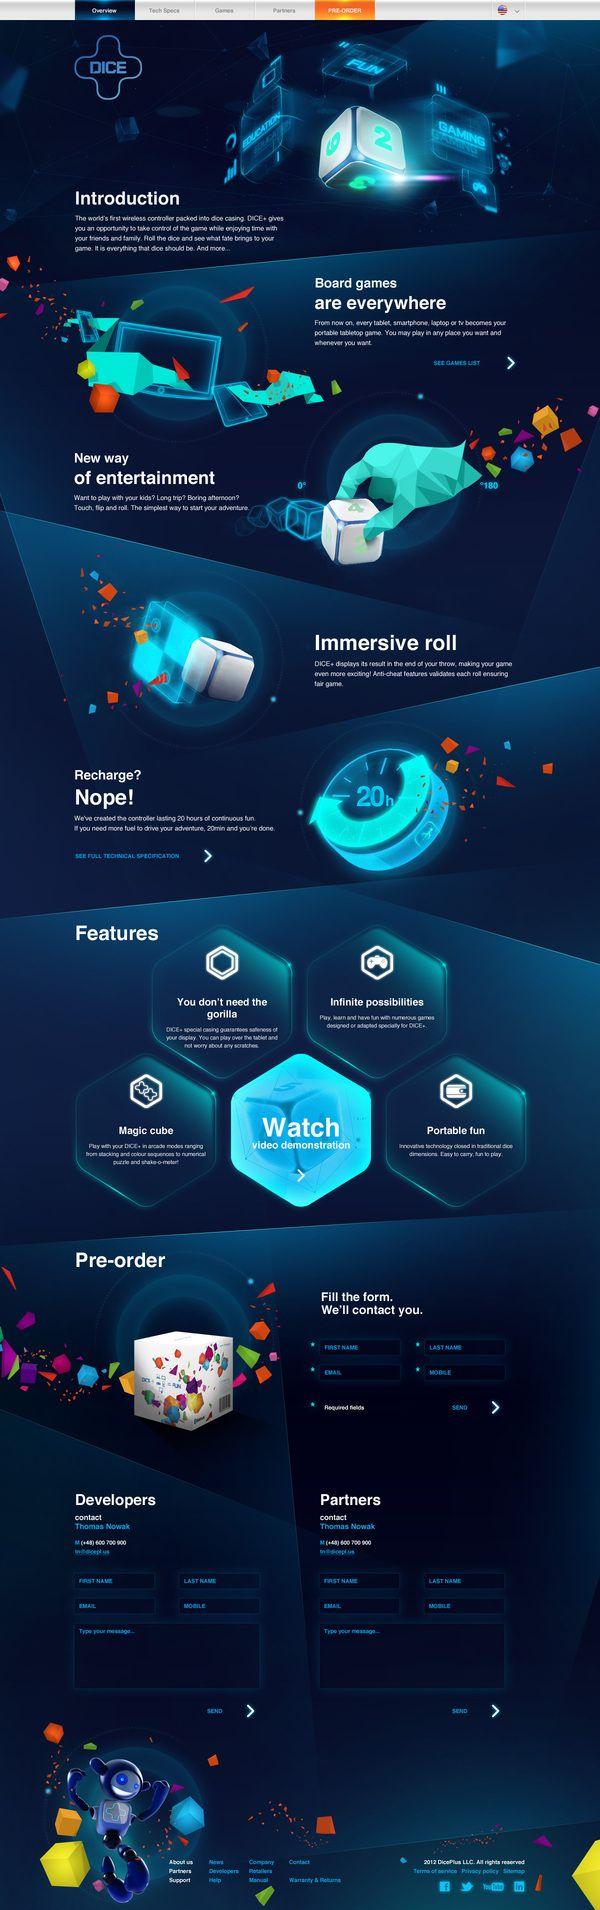 Cool Web Design on the Internet, DICE. #webdesign #webdevelopment ...